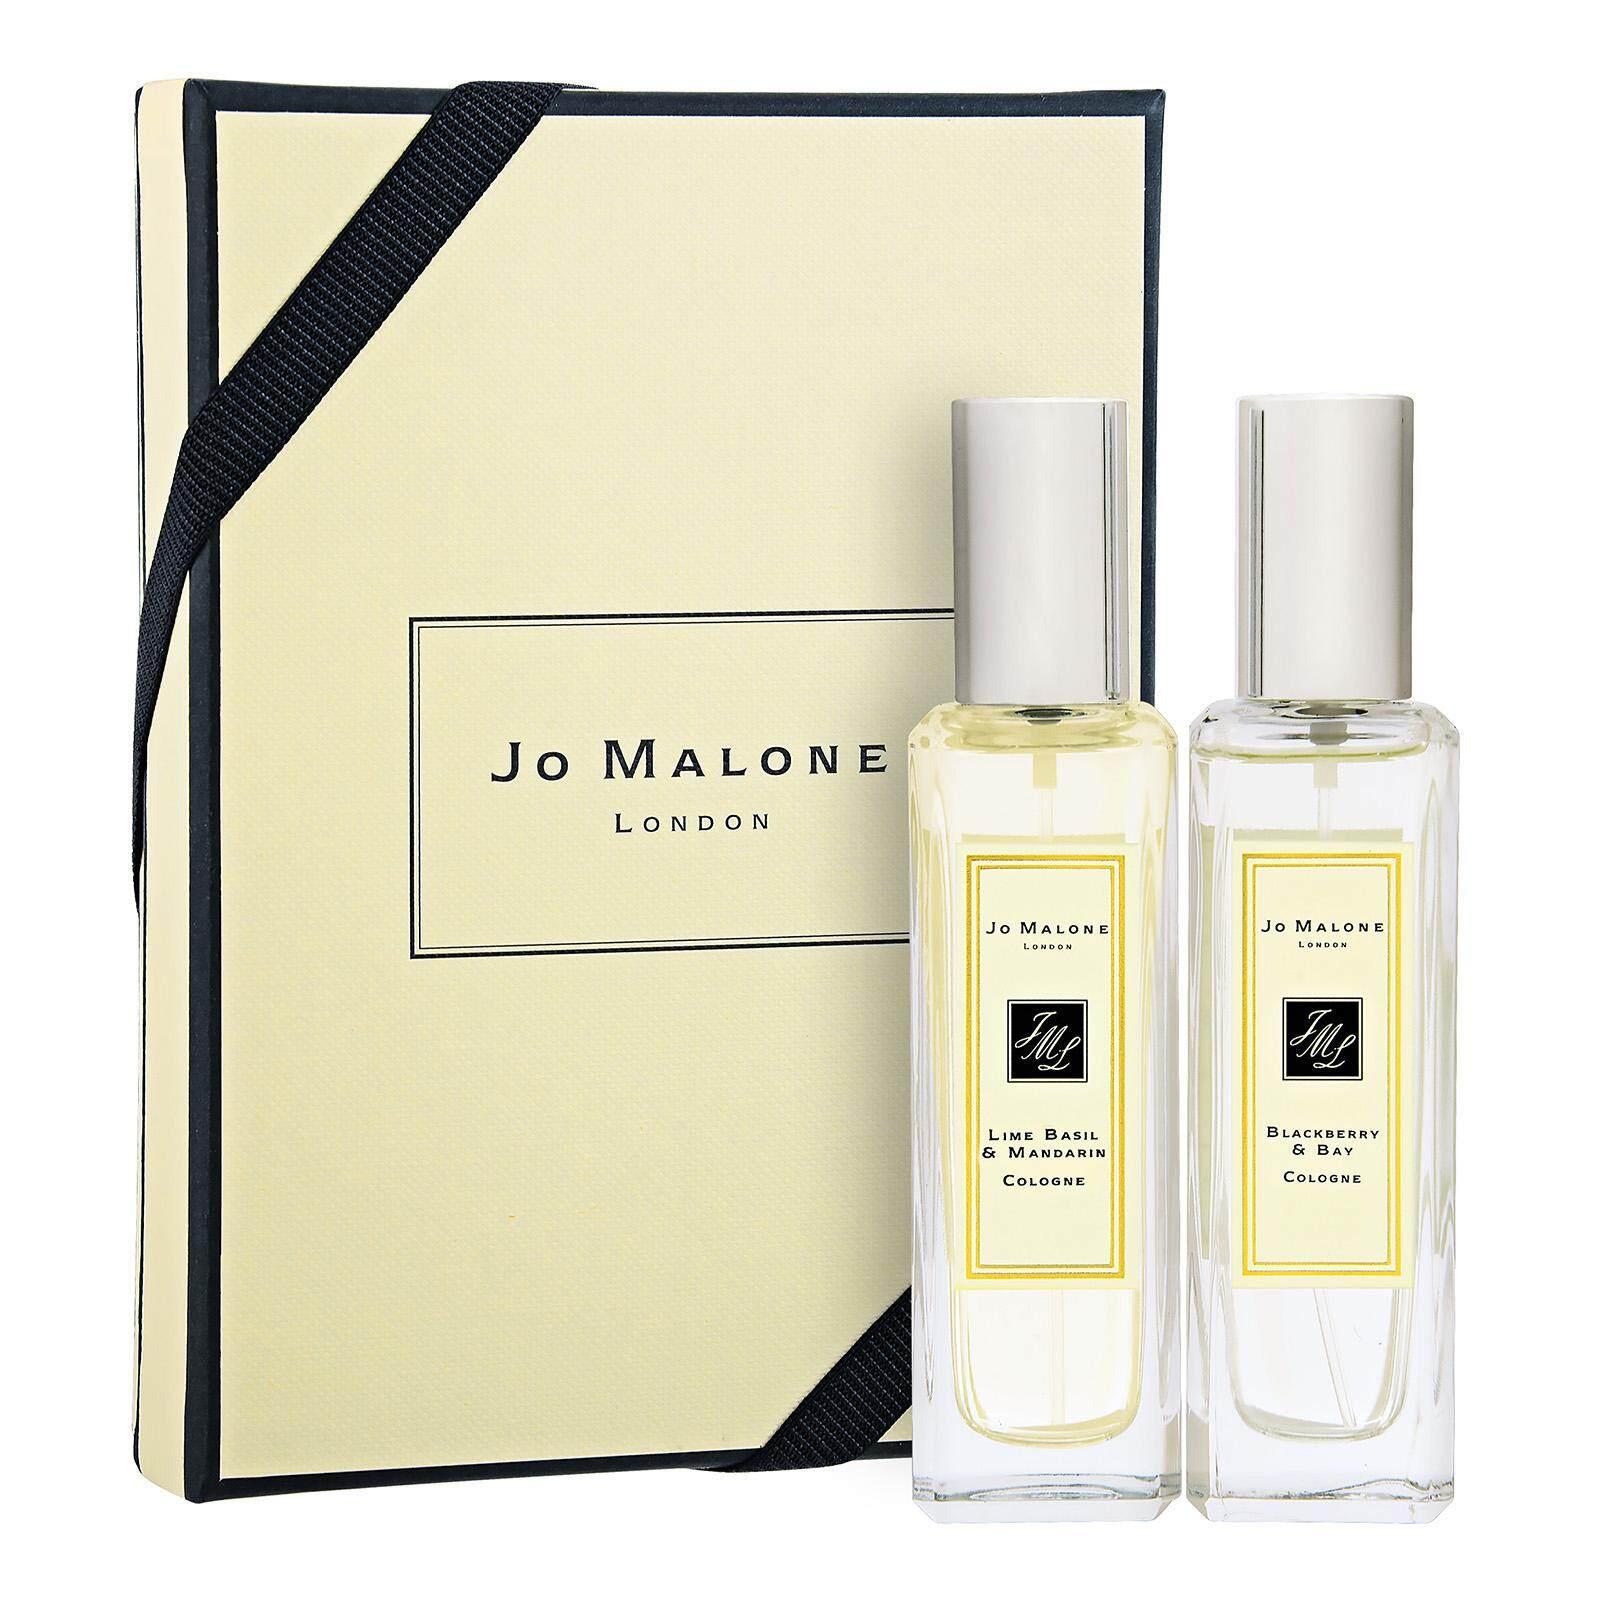 Latest Jo Malone Fragrances Products Enjoy Huge Discounts Lazada Sg Black Oud 2 Pcs Lime Basil Mandarin Blackberry Bay Cologne Set 2pcs X 30ml